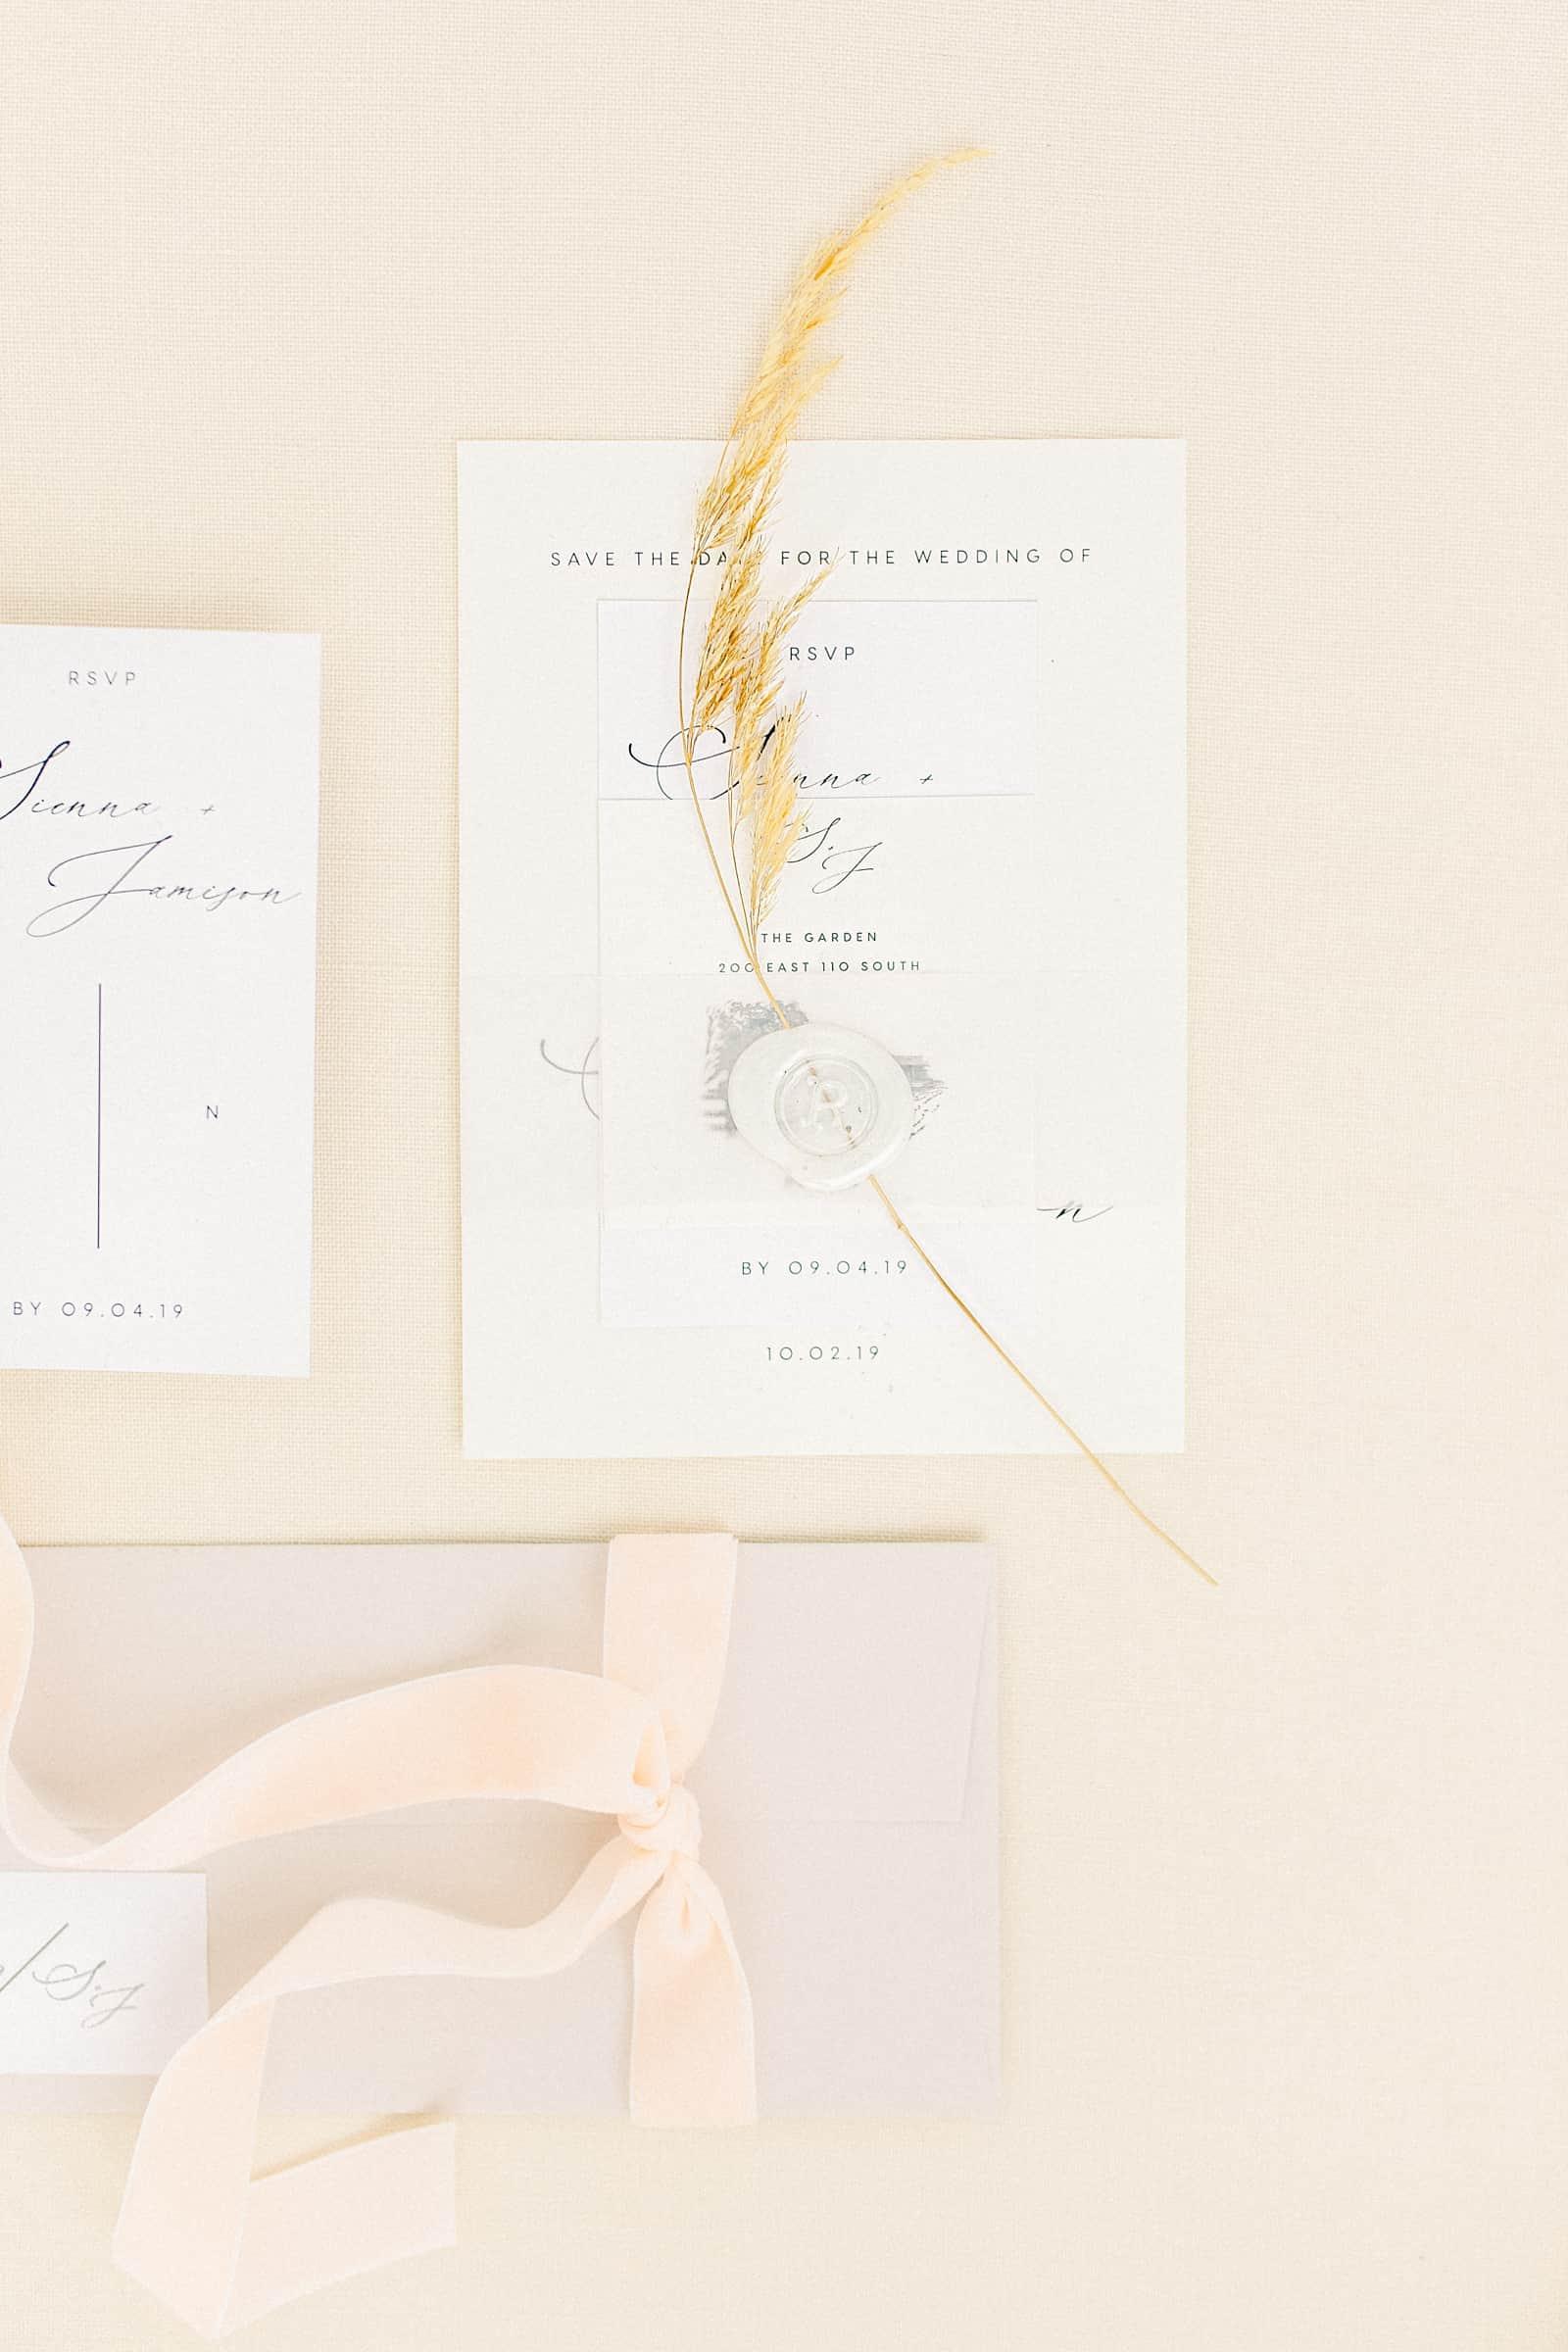 Modern minimalist wedding invitations with white wax seal